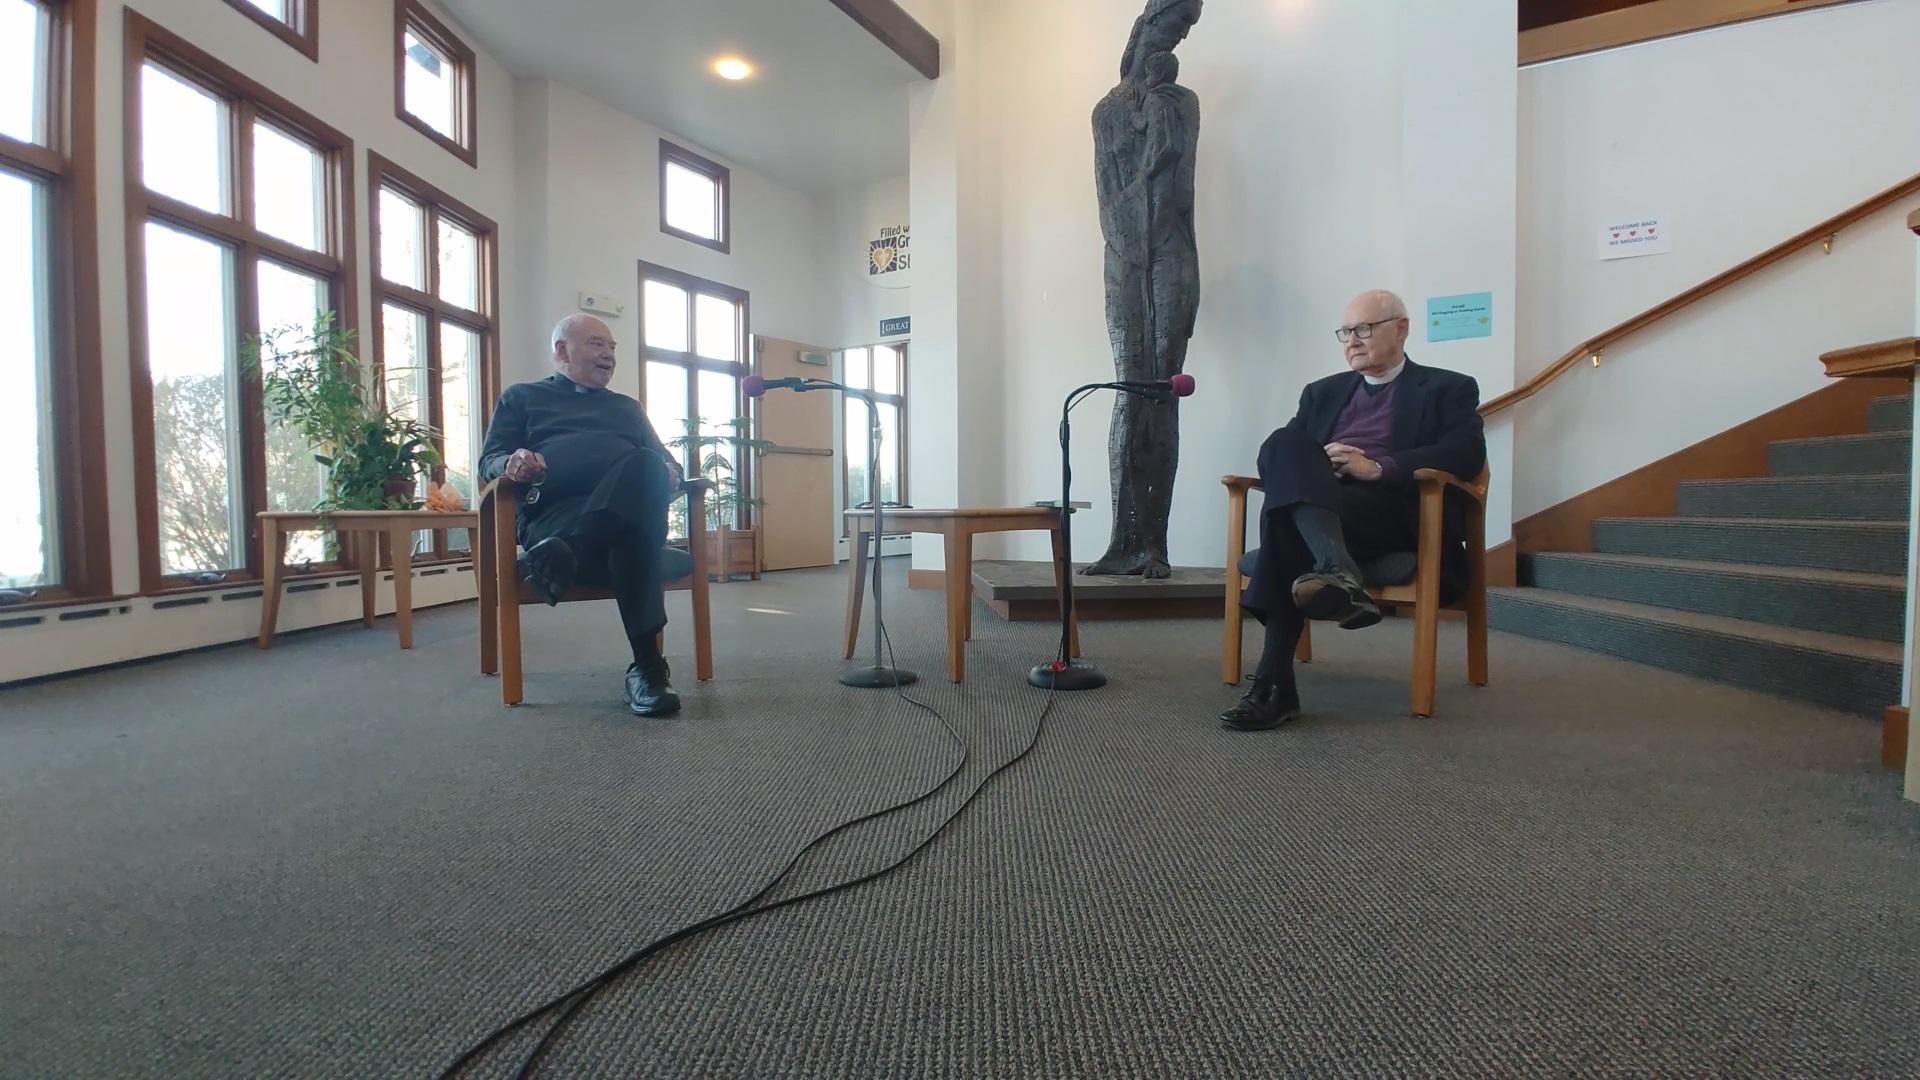 Interim Pastor David Mueller and the Very Rev. Bill Lane